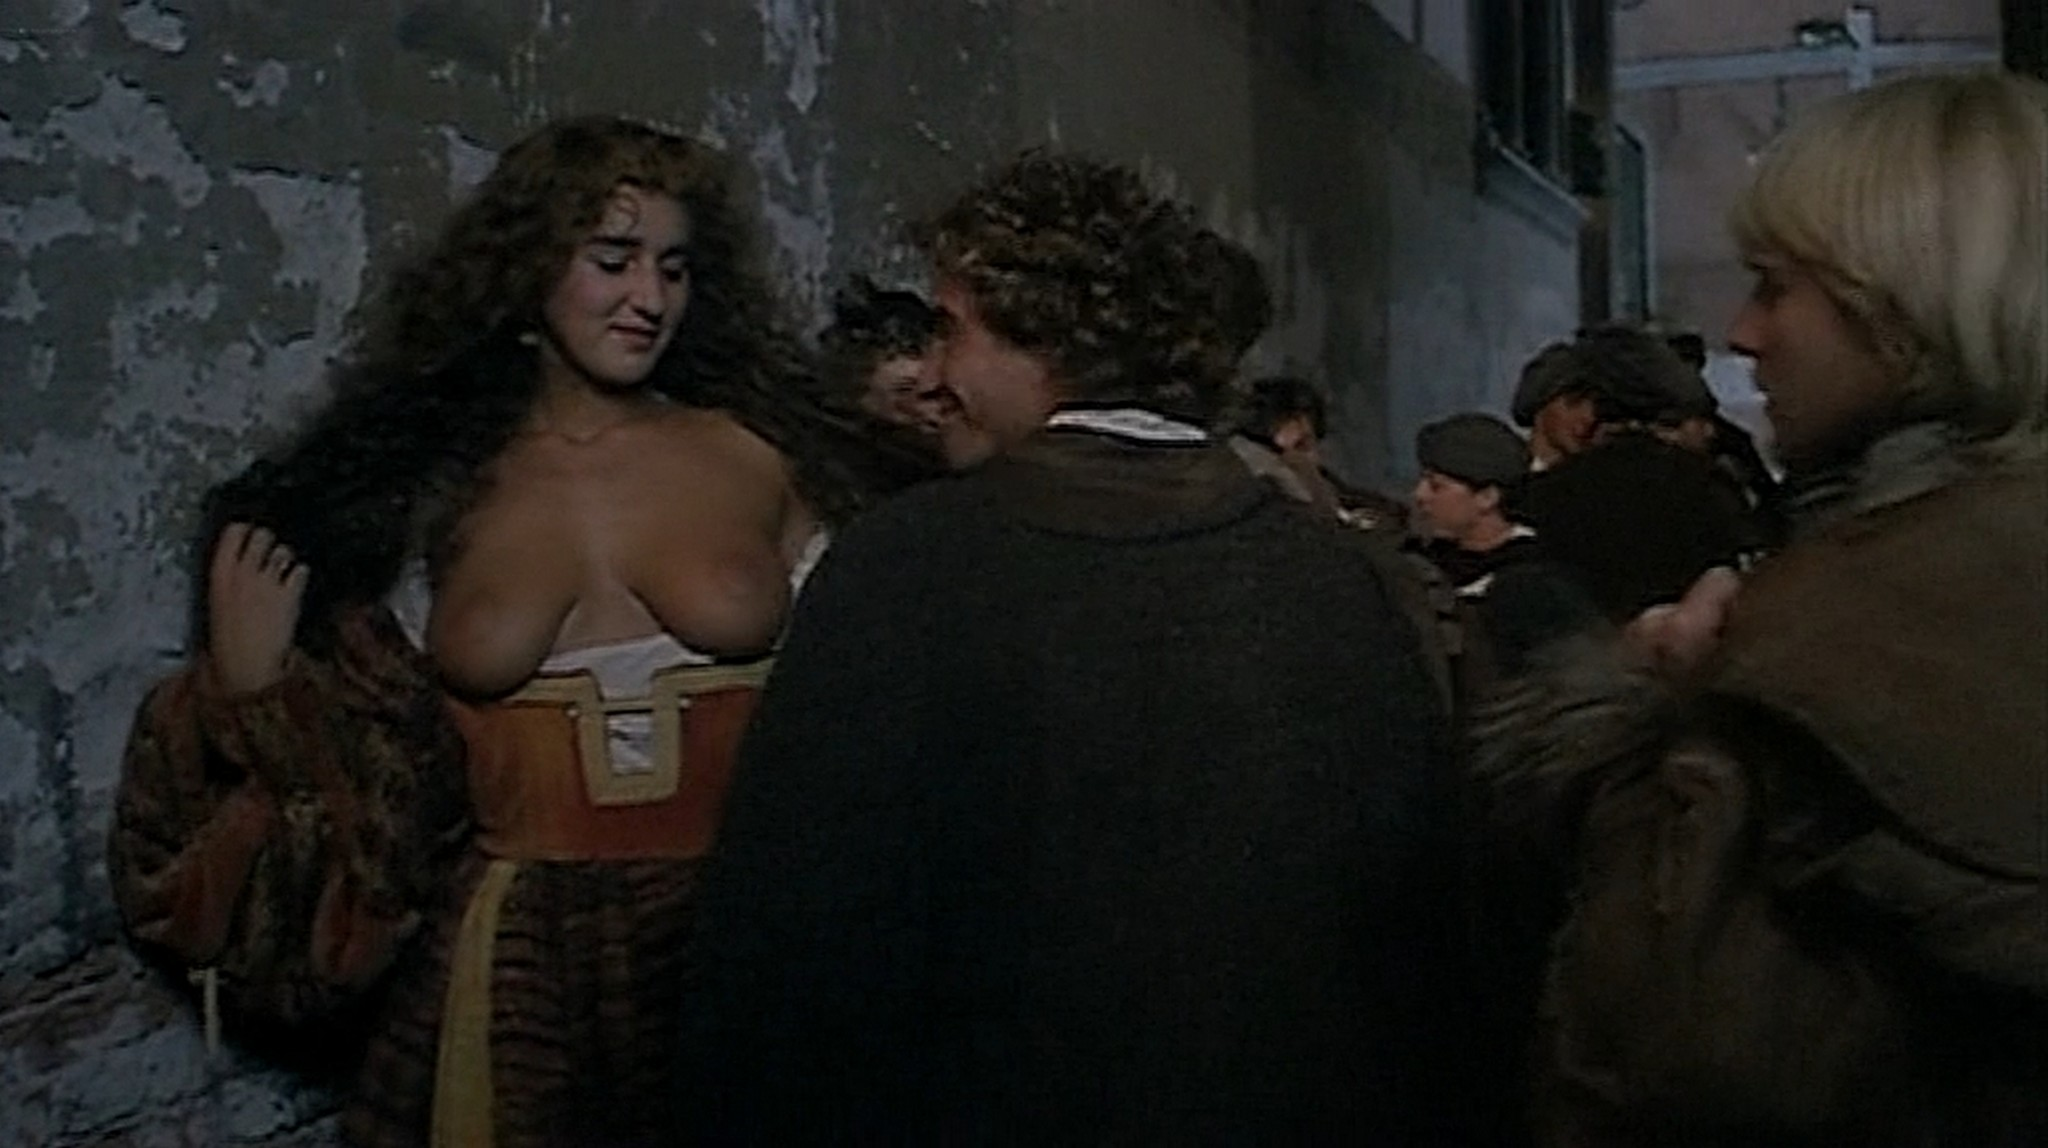 Laura Antonelli nude topless and sex Monica Guerritore nude topless and Clelia Rondinella nude lesbian sex La Venexiana 1986 DVDRip